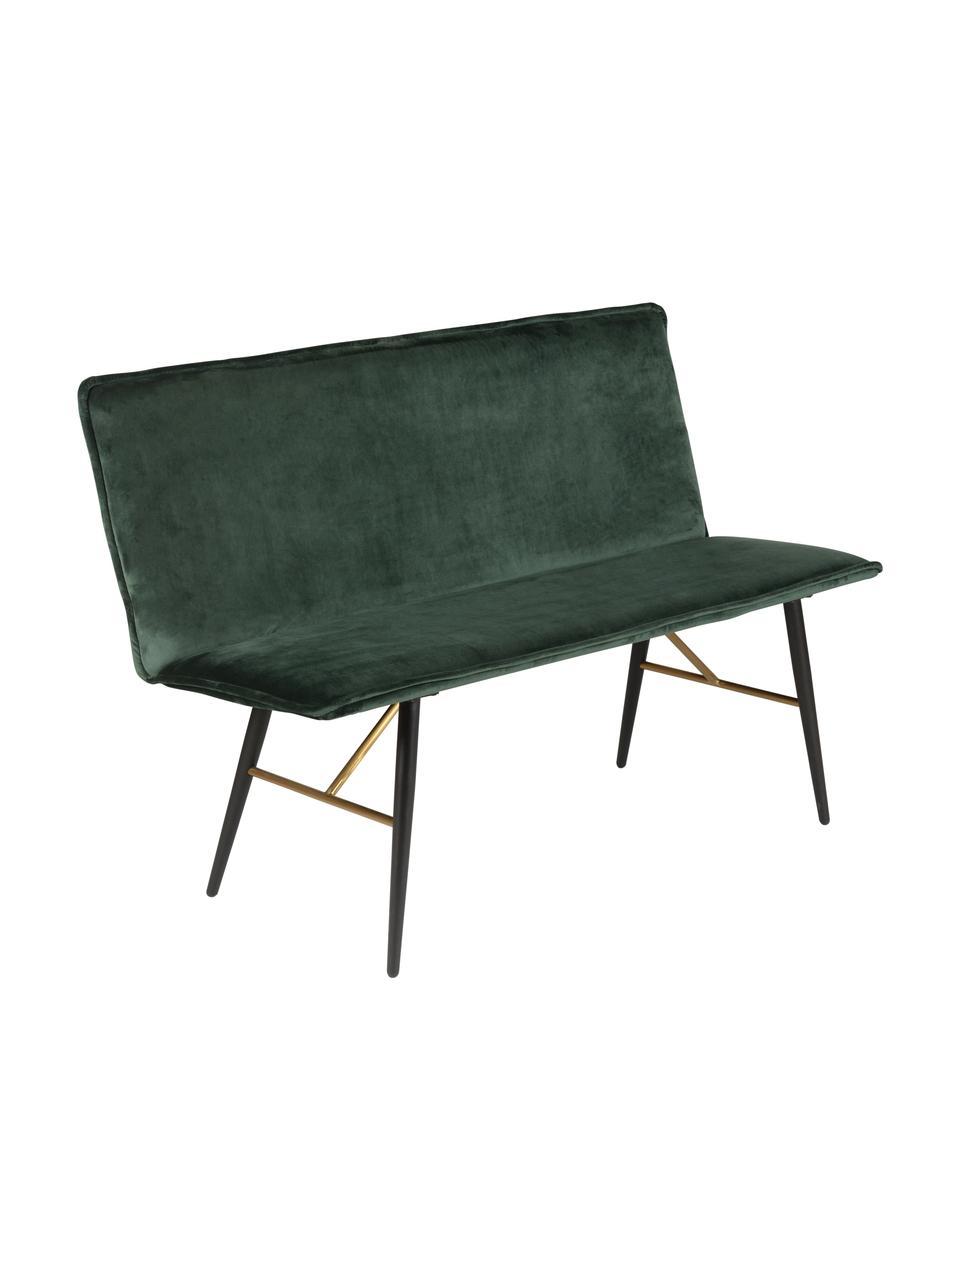 Fluwelen eetkamerbank Verona, Bekleding: polyester fluweel, Groen, zwart, B 134 x D 55 cm